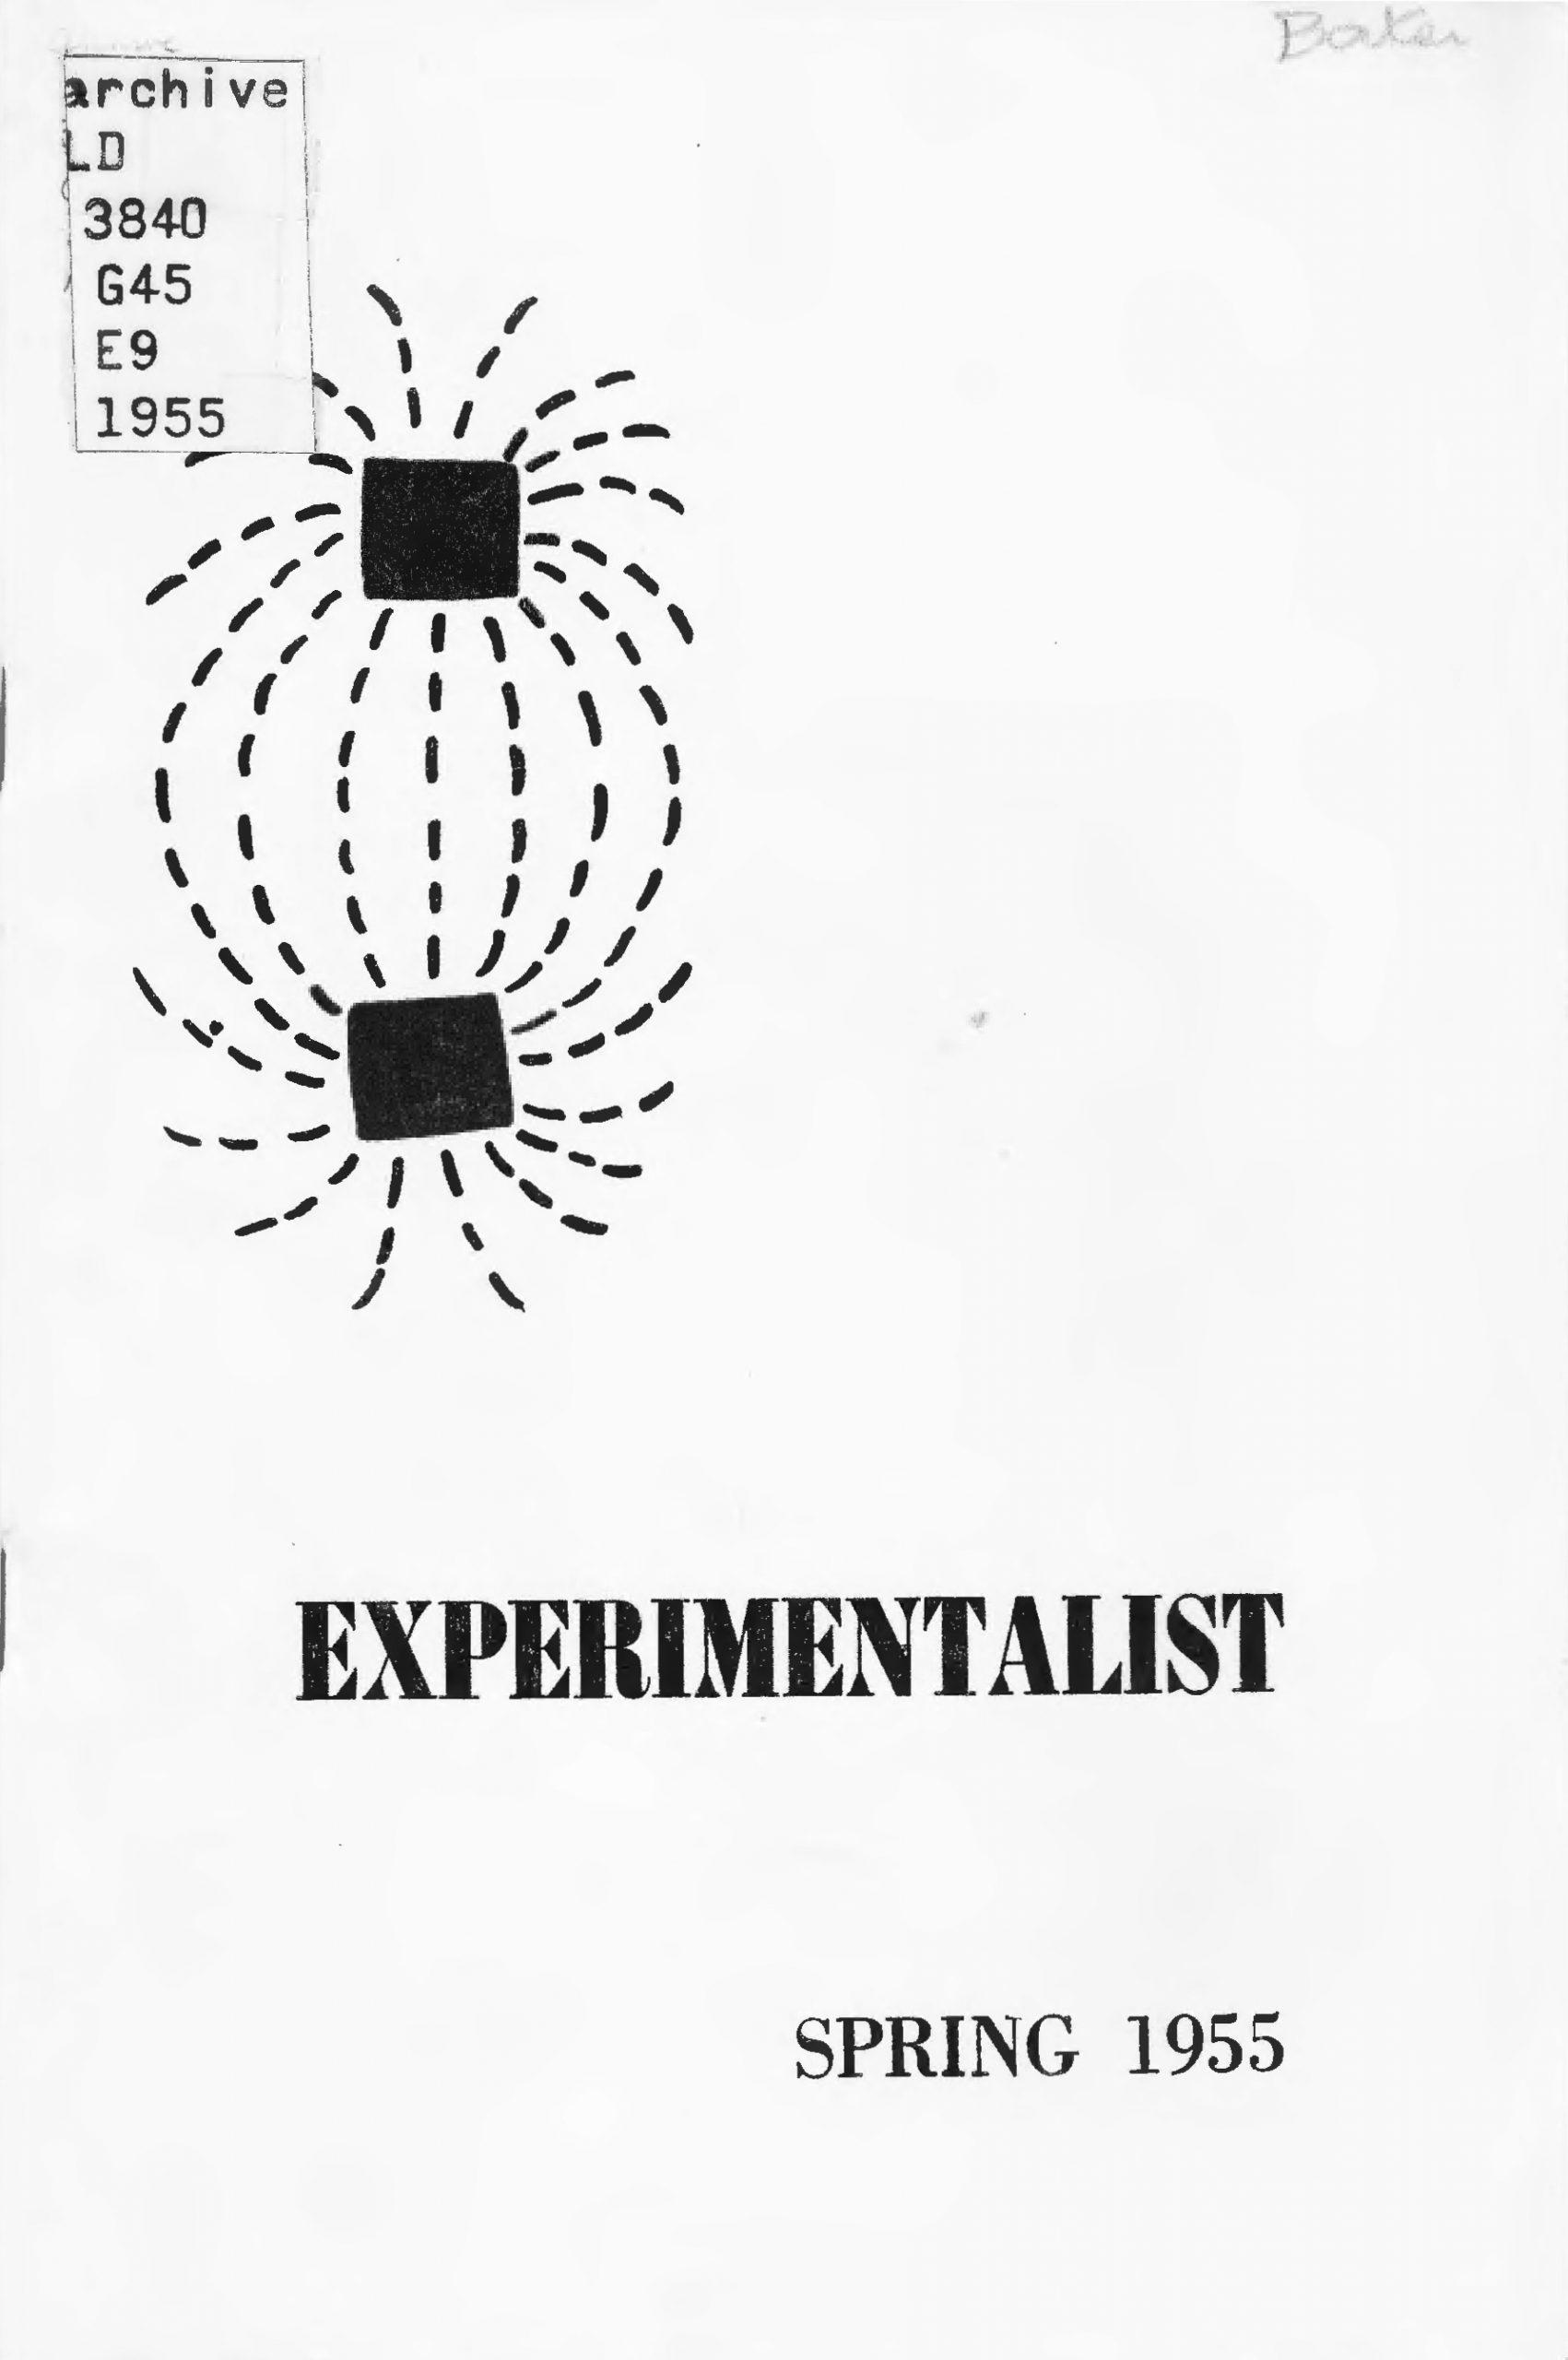 Experimentalist cover